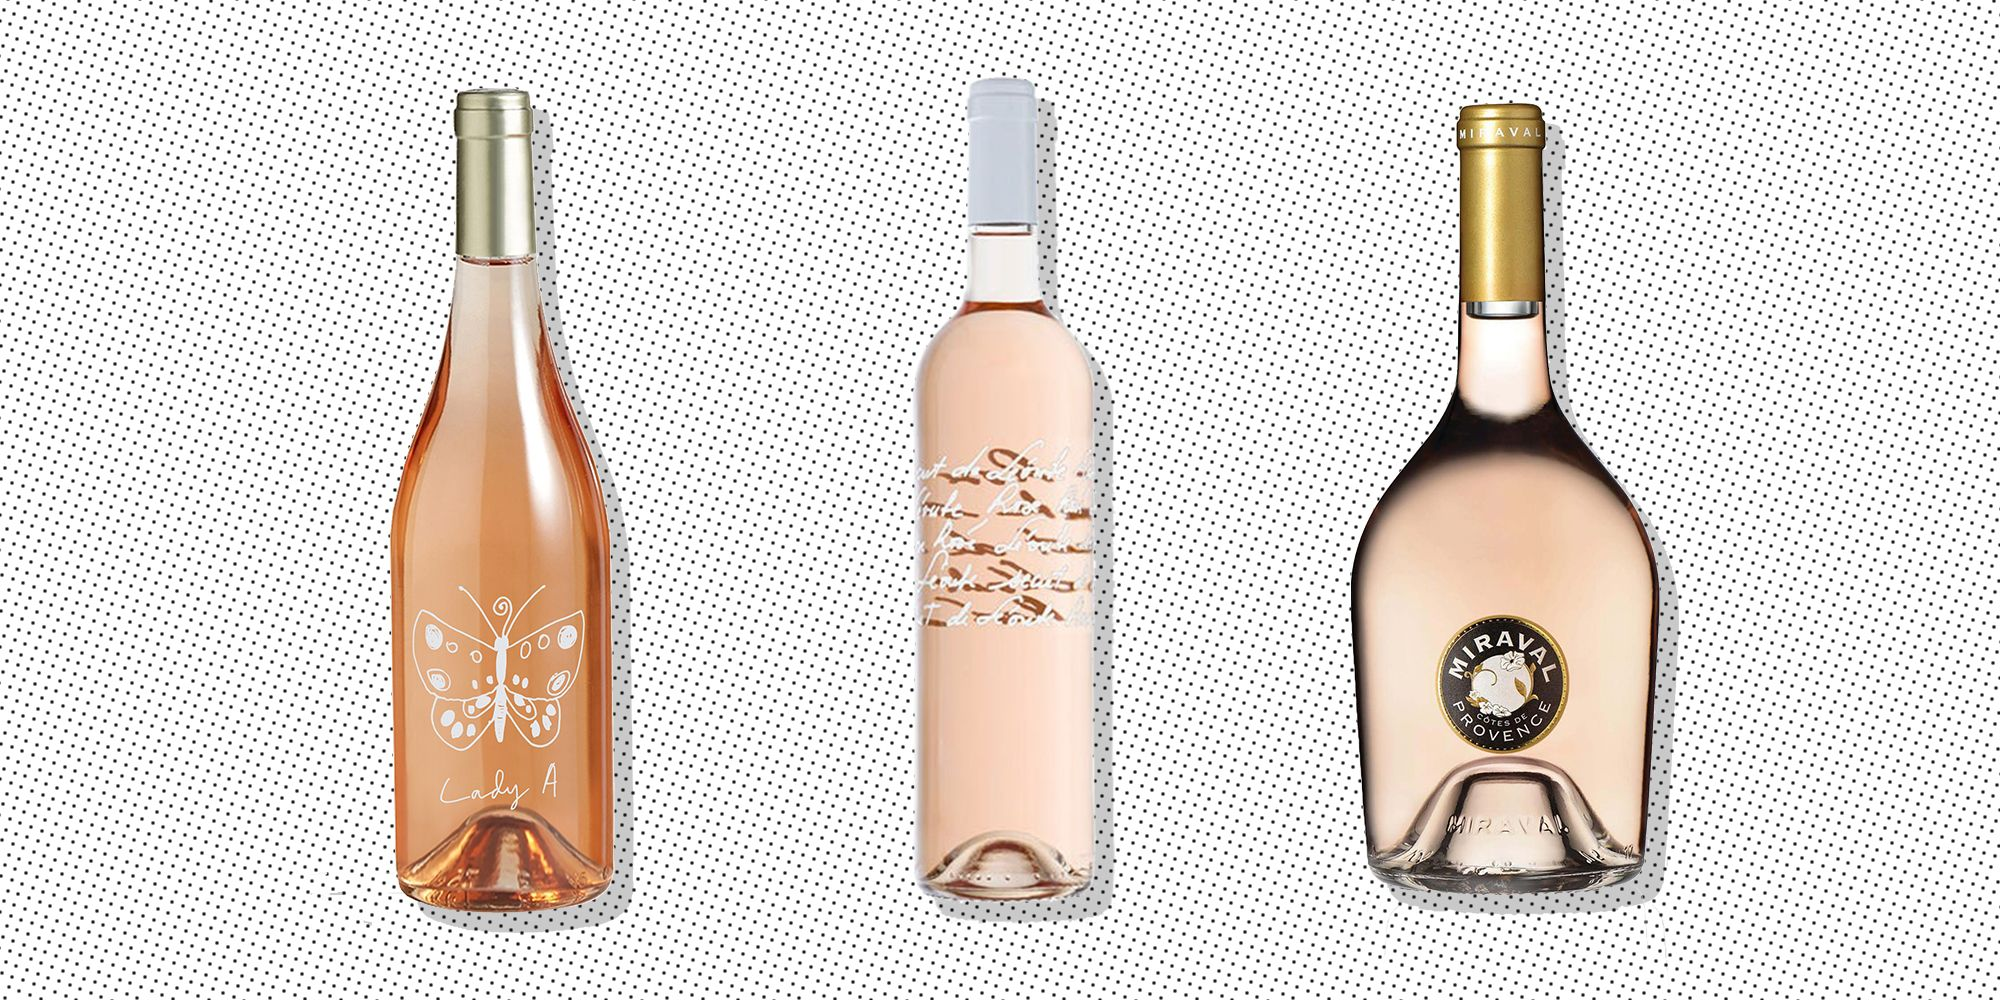 16 Best Luxury Rosés To Drink All Summer Long